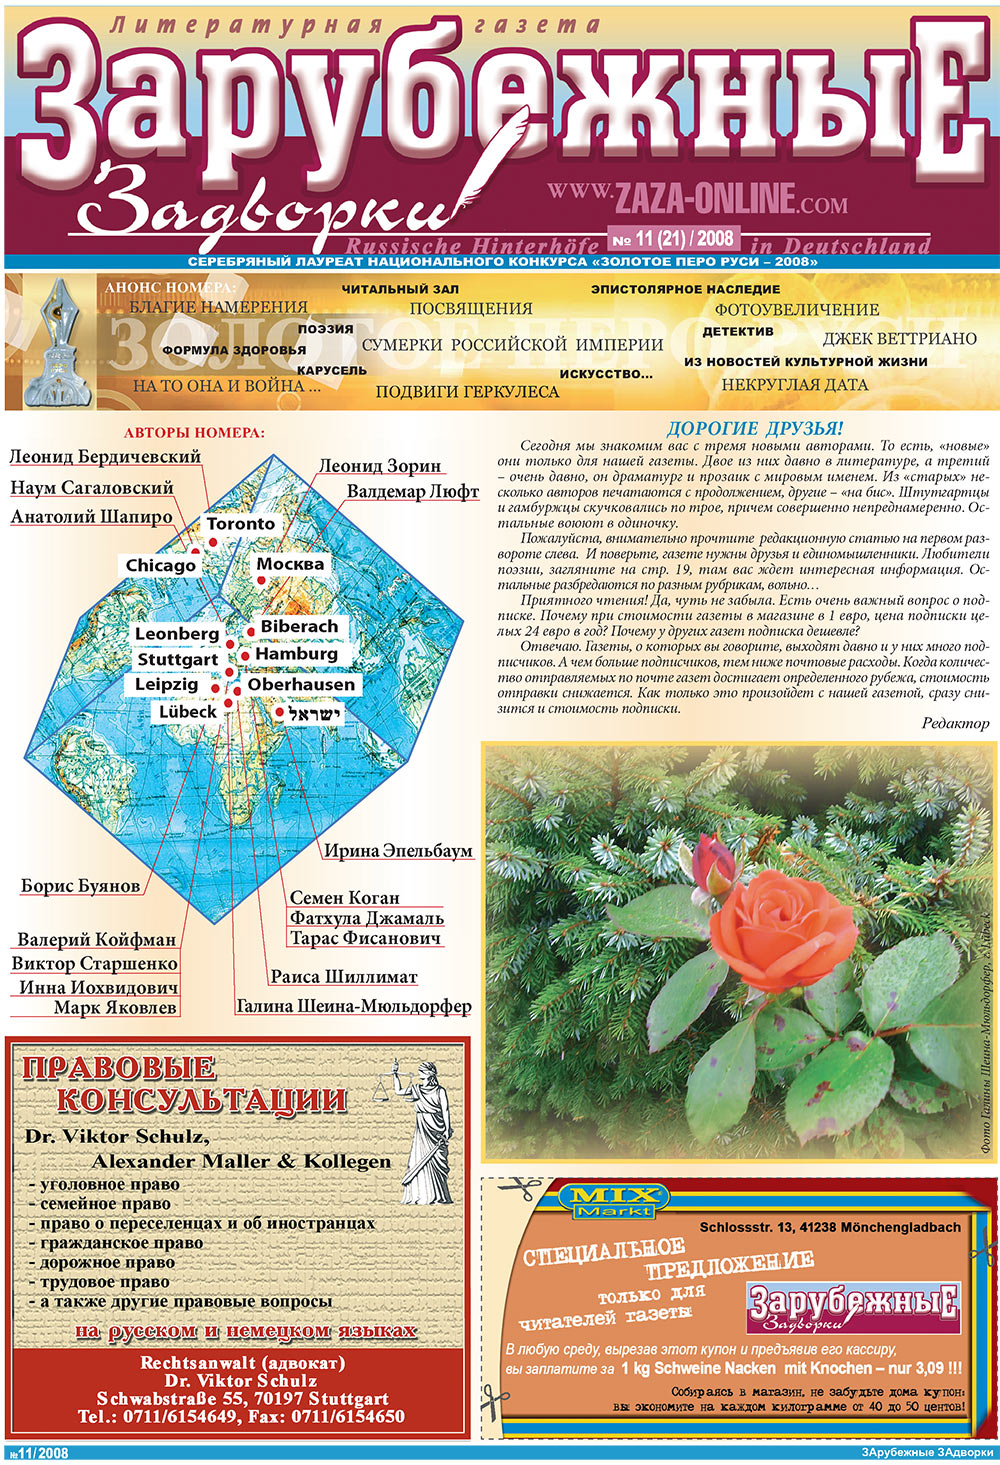 Известия BW (газета). 2008 год, номер 11, стр. 1